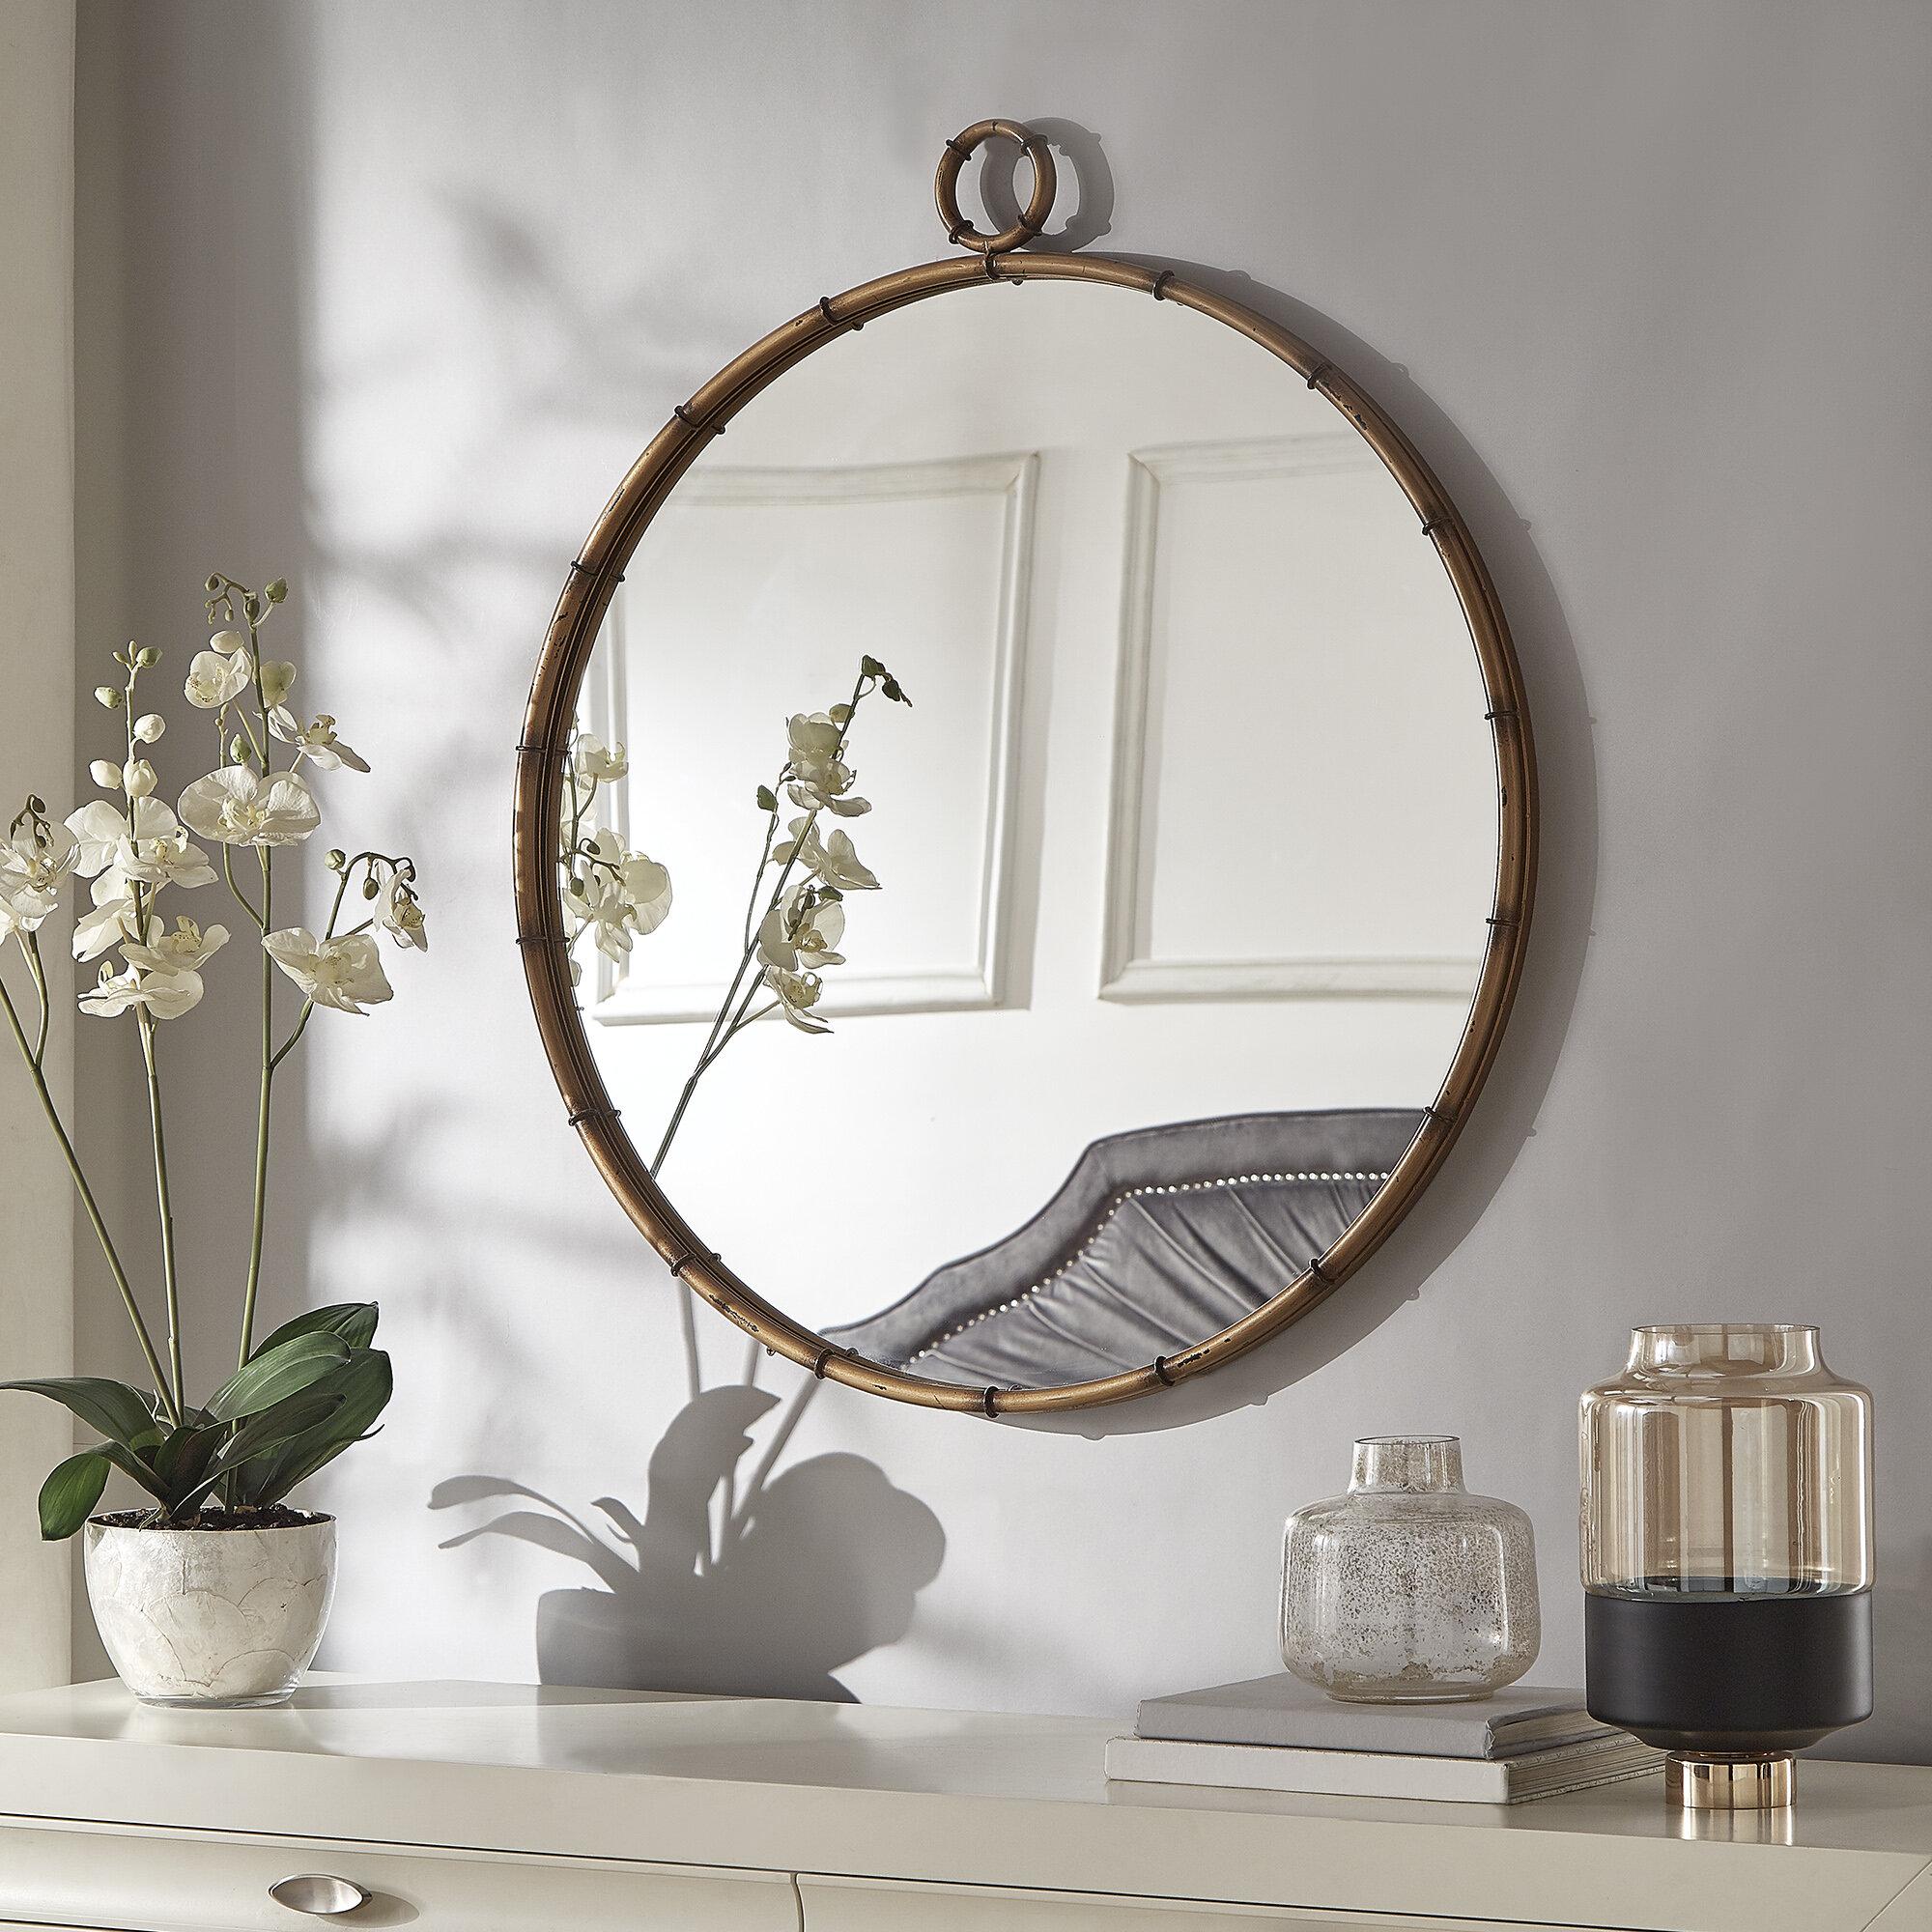 Brass Coastal Mirrors You Ll Love In 2021 Wayfair